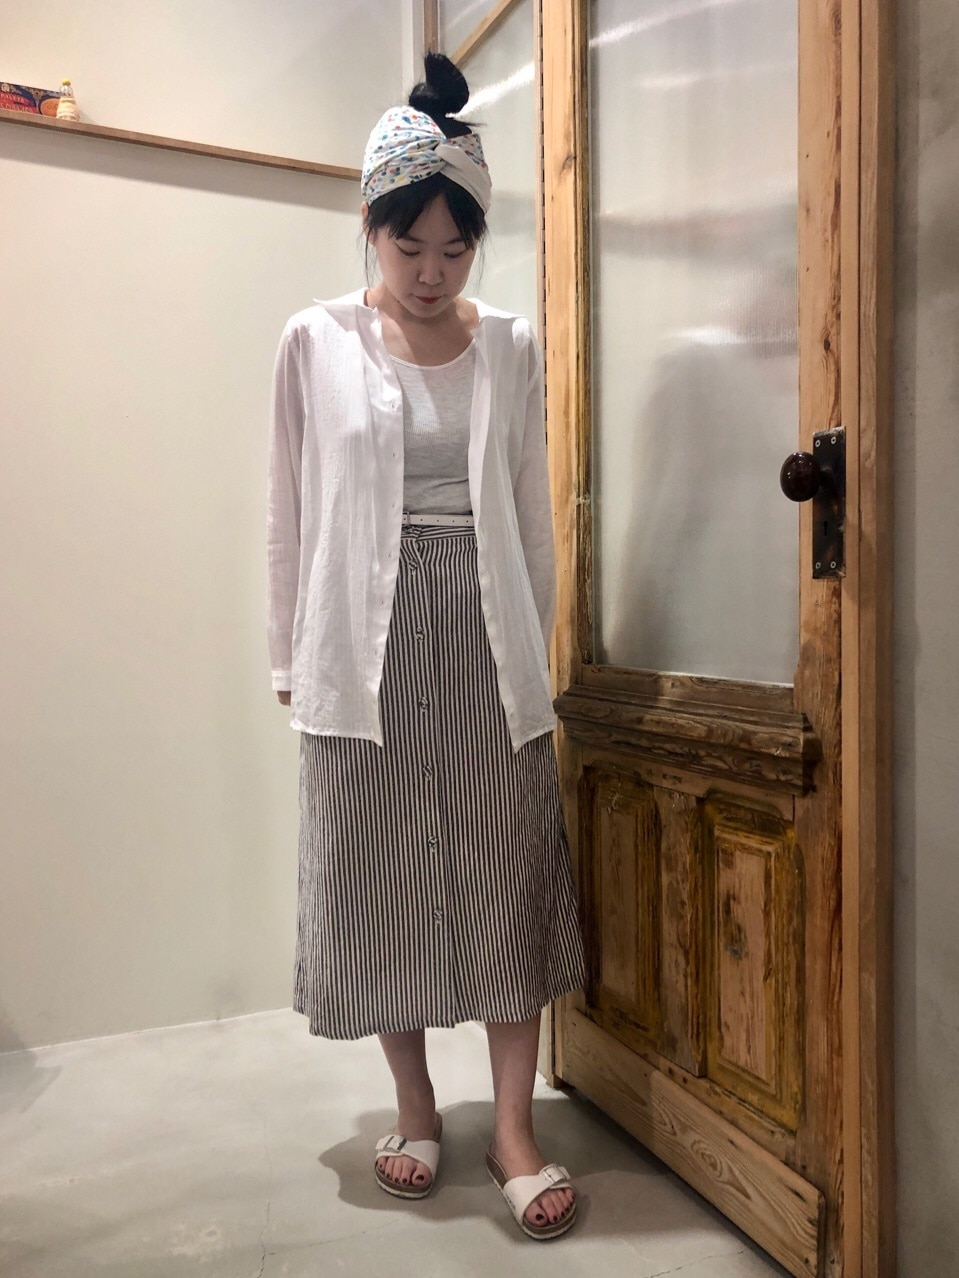 bulle de savon 渋谷スクランブルスクエア 身長:157cm 2020.07.03